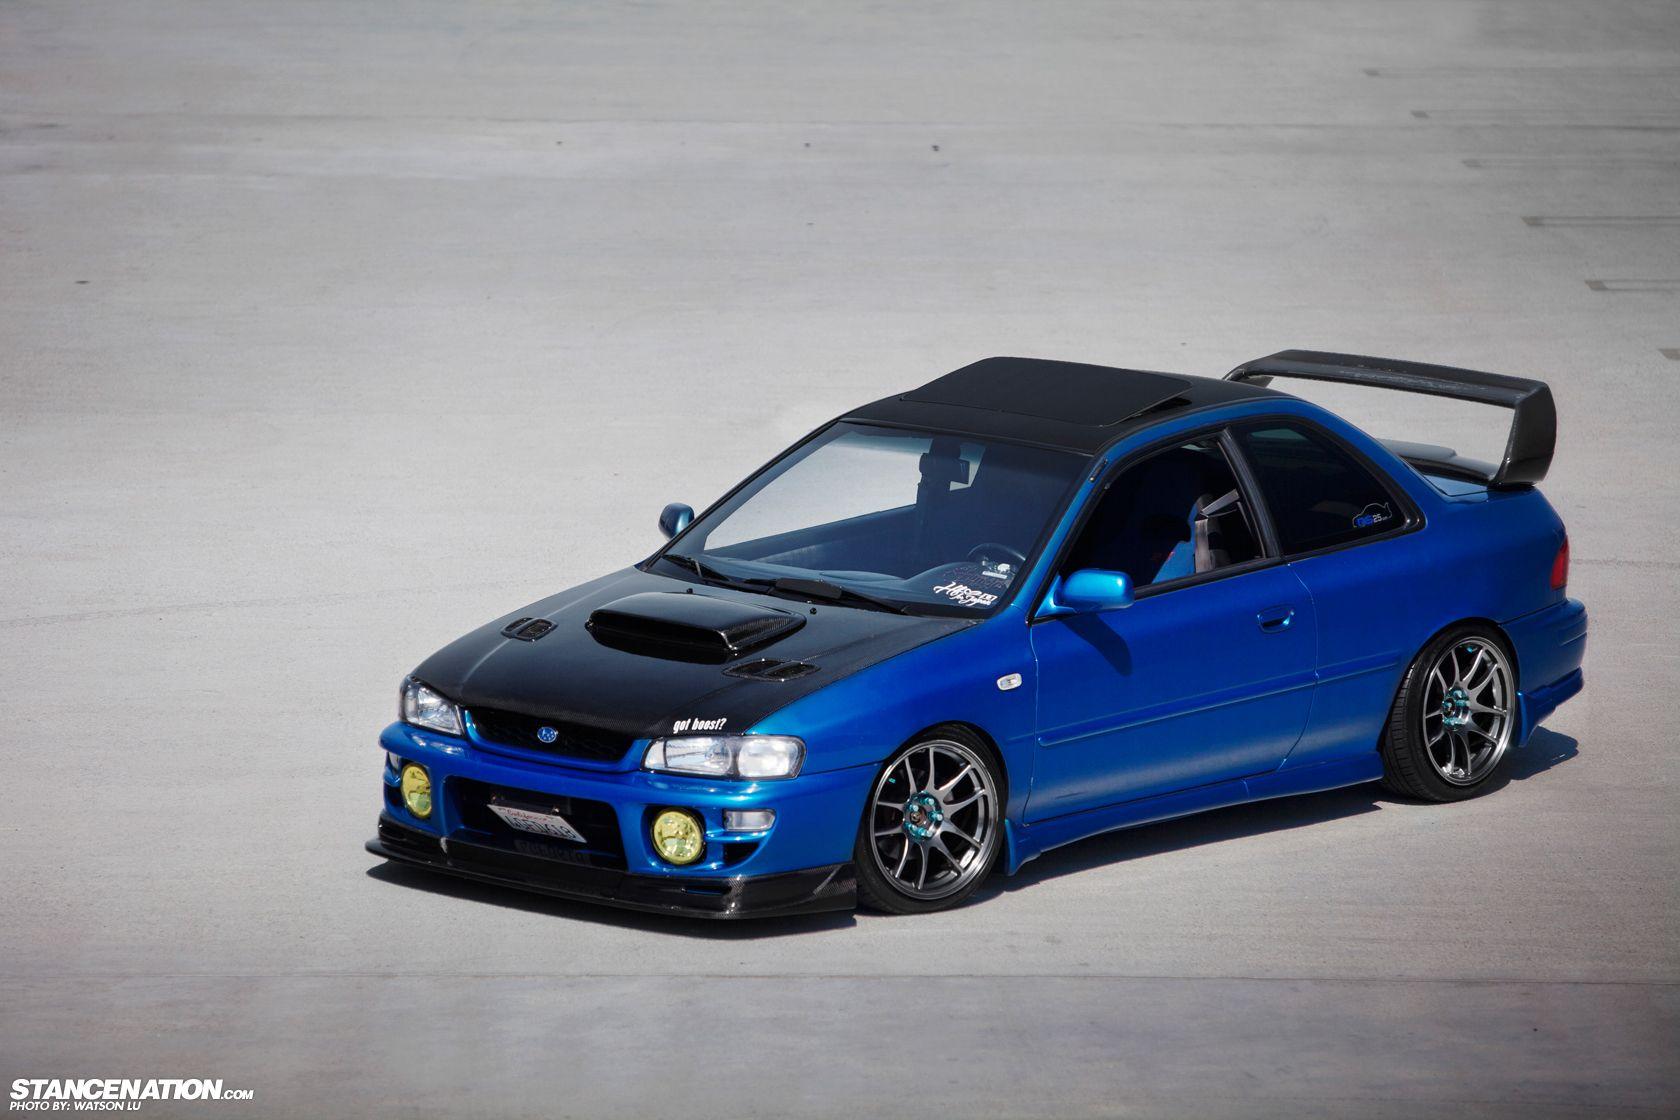 Subaru impreza wrx sti gc8 automobiles pinterest subaru impreza subaru and cars